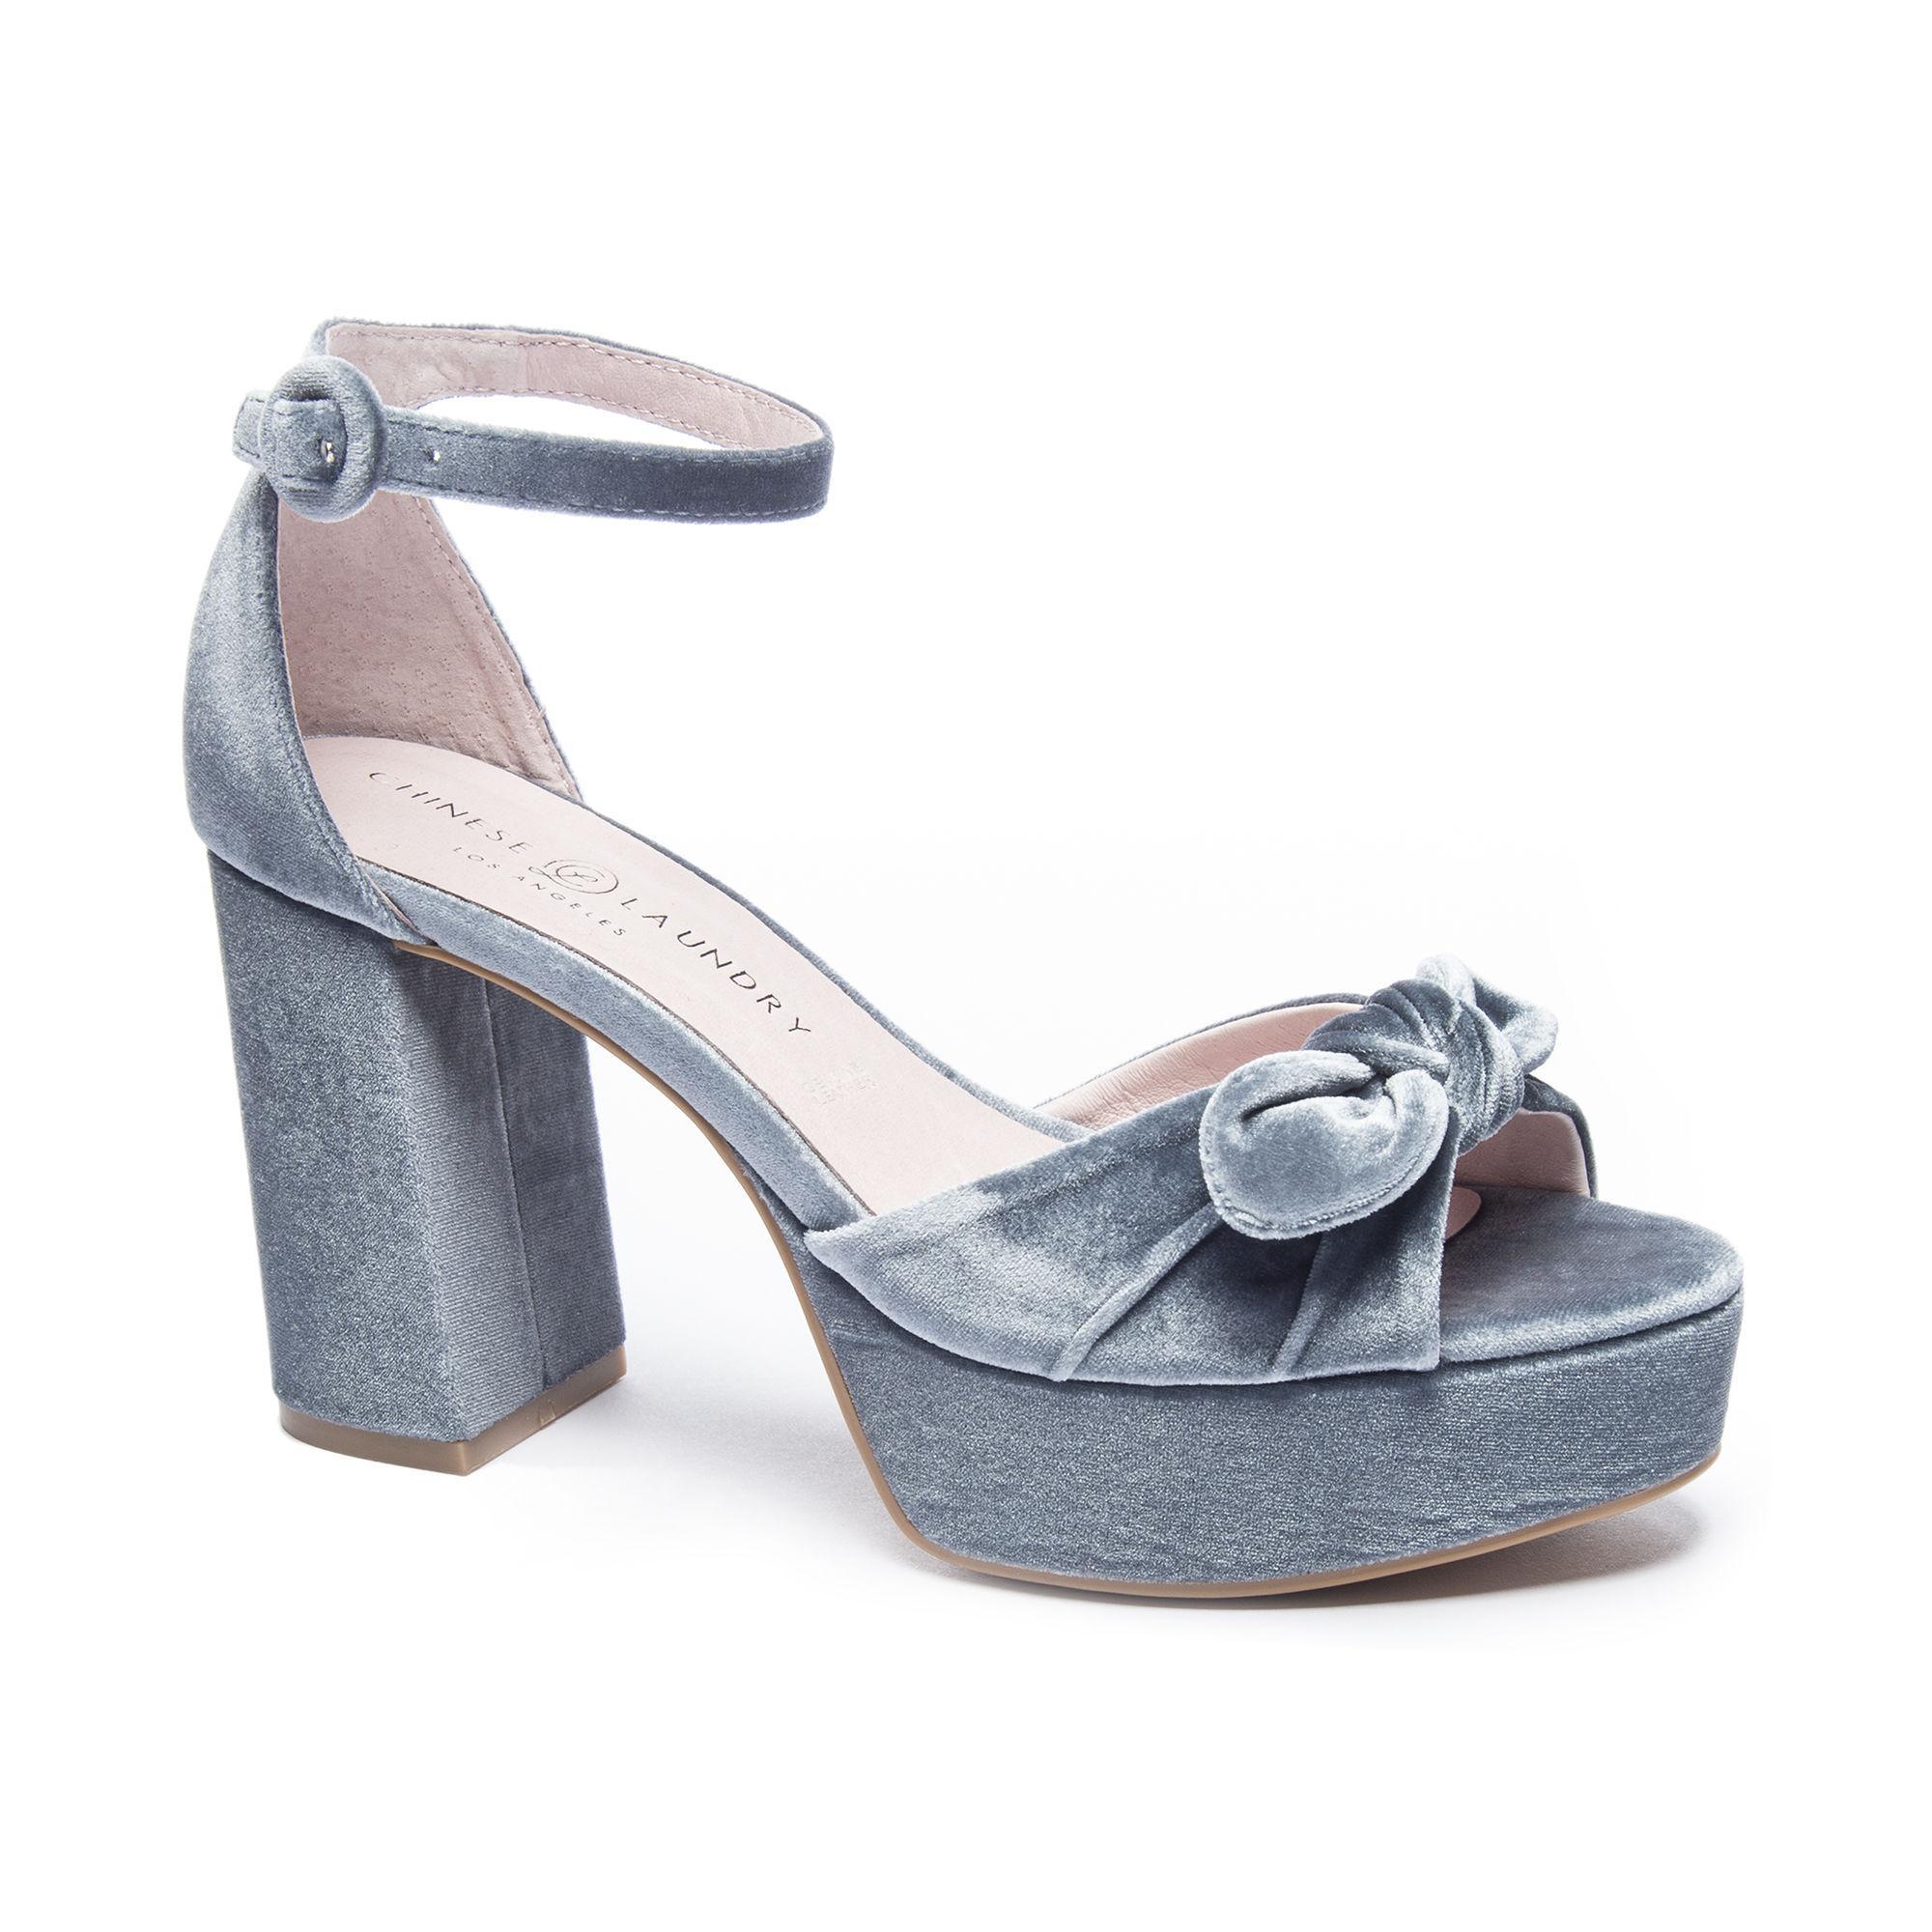 9cc8041504a0 Lyst - Chinese Laundry Tina Velvet Platform Sandal in Blue